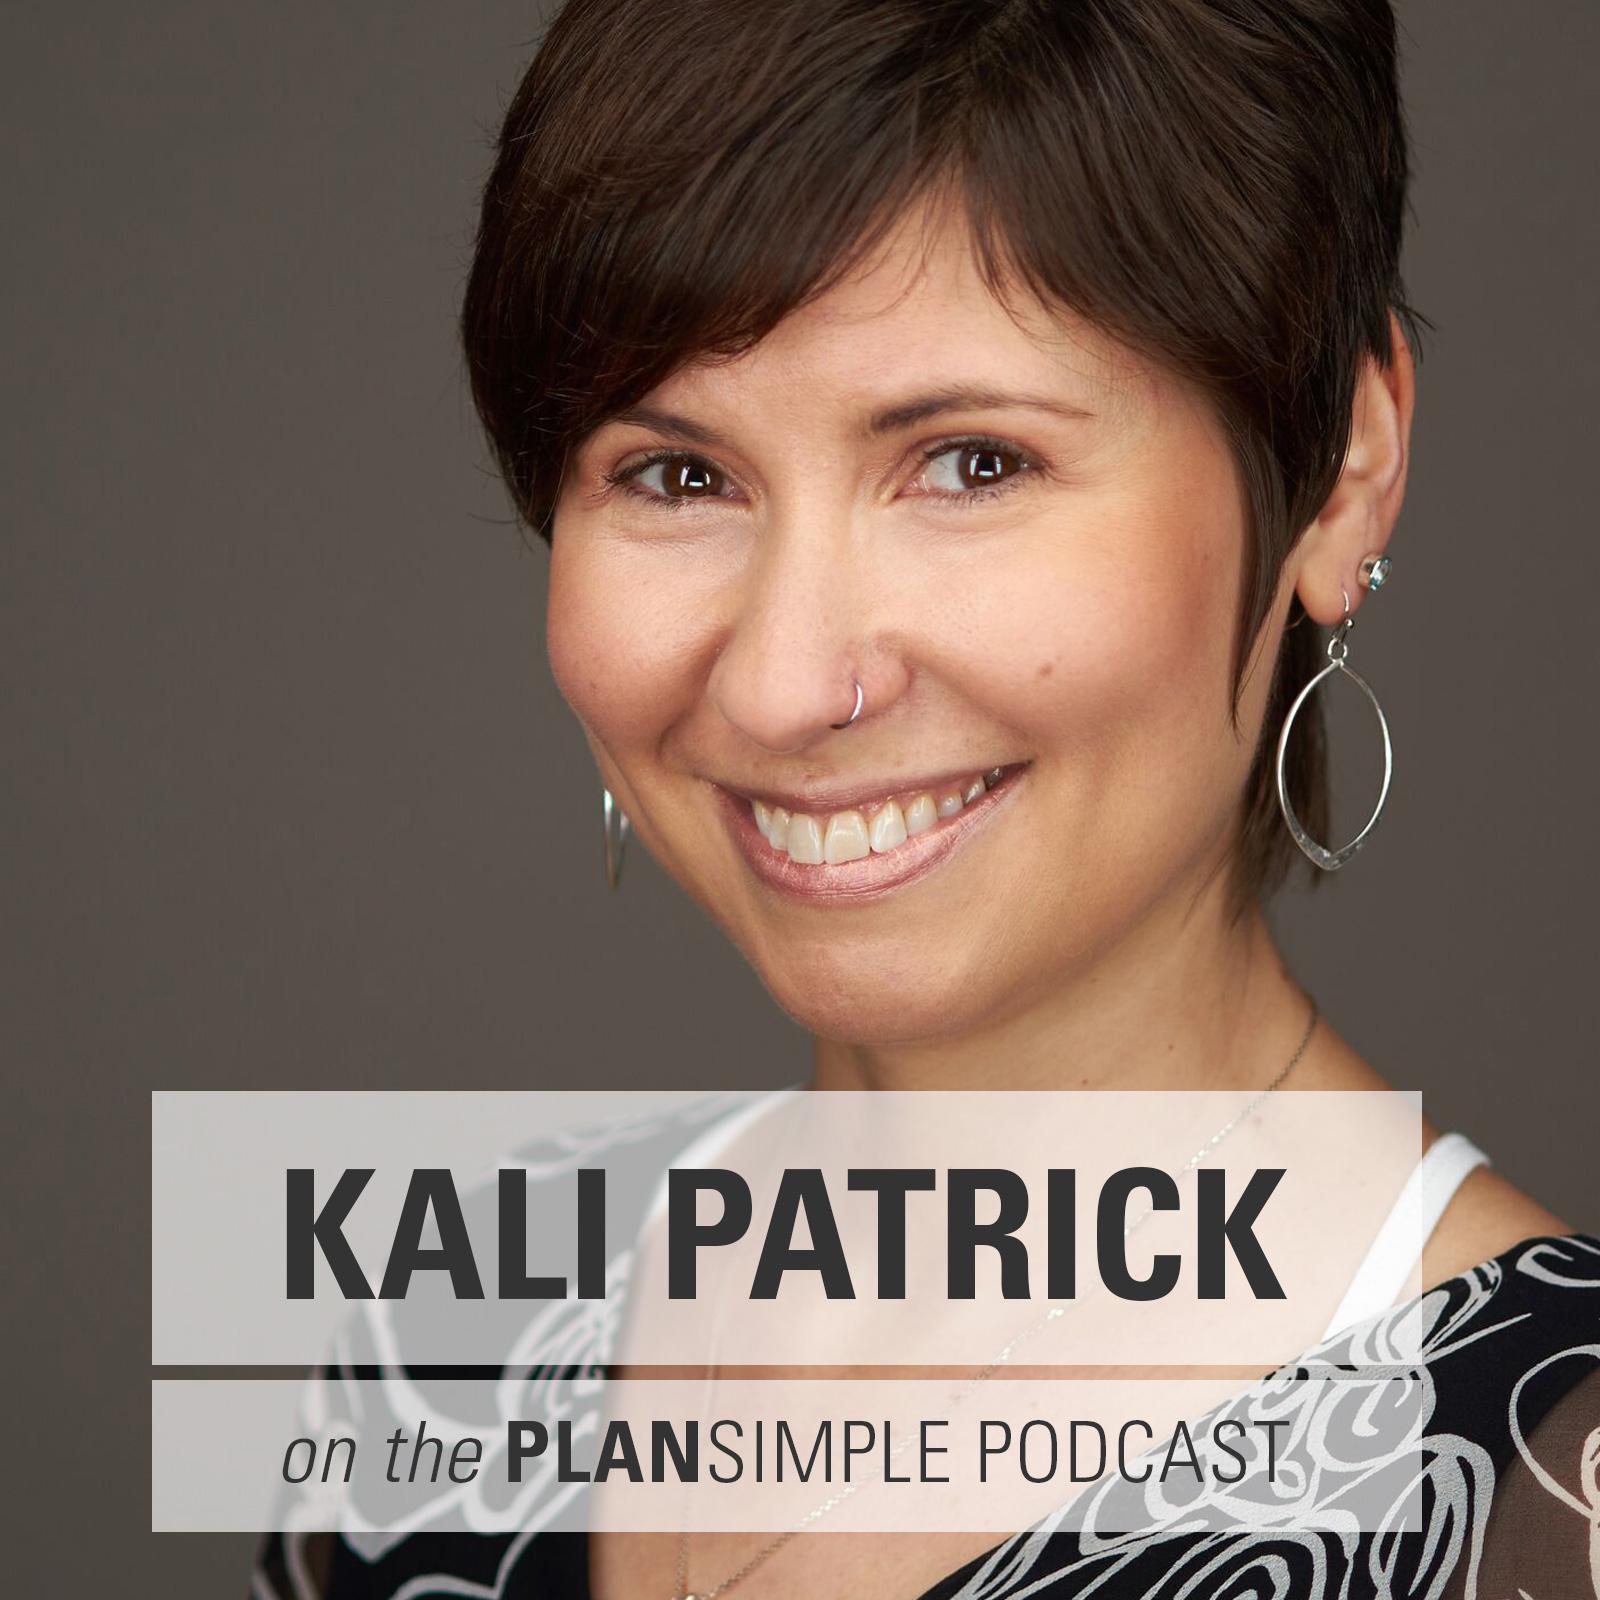 Meet Kali Patrick